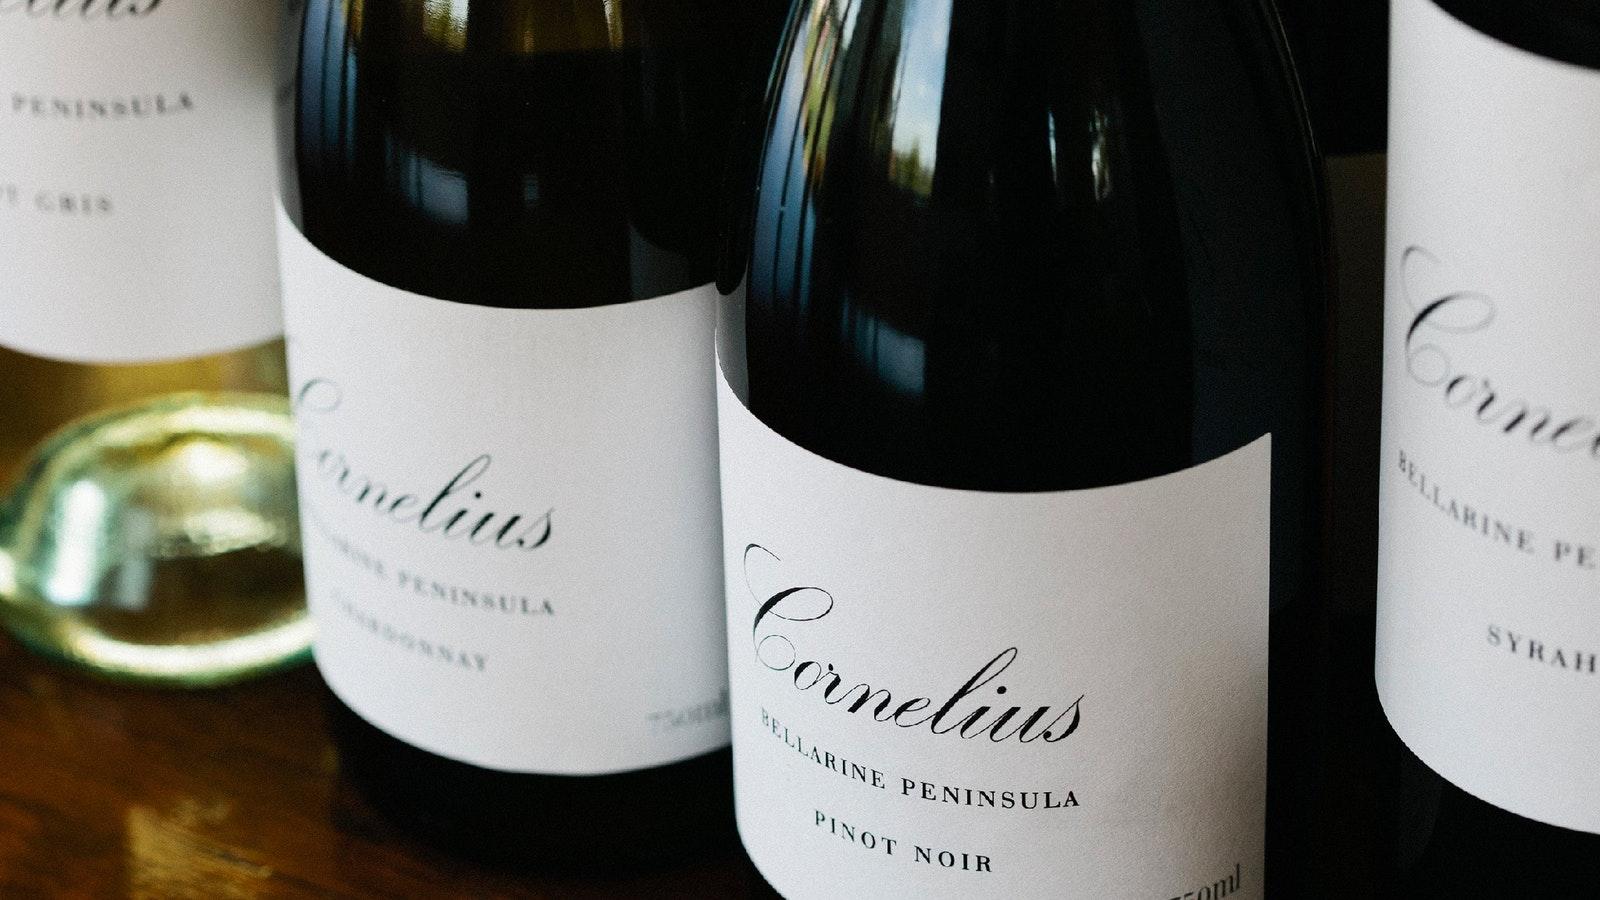 Scotchmans Hill's Single Vineyard Cornelius Wines